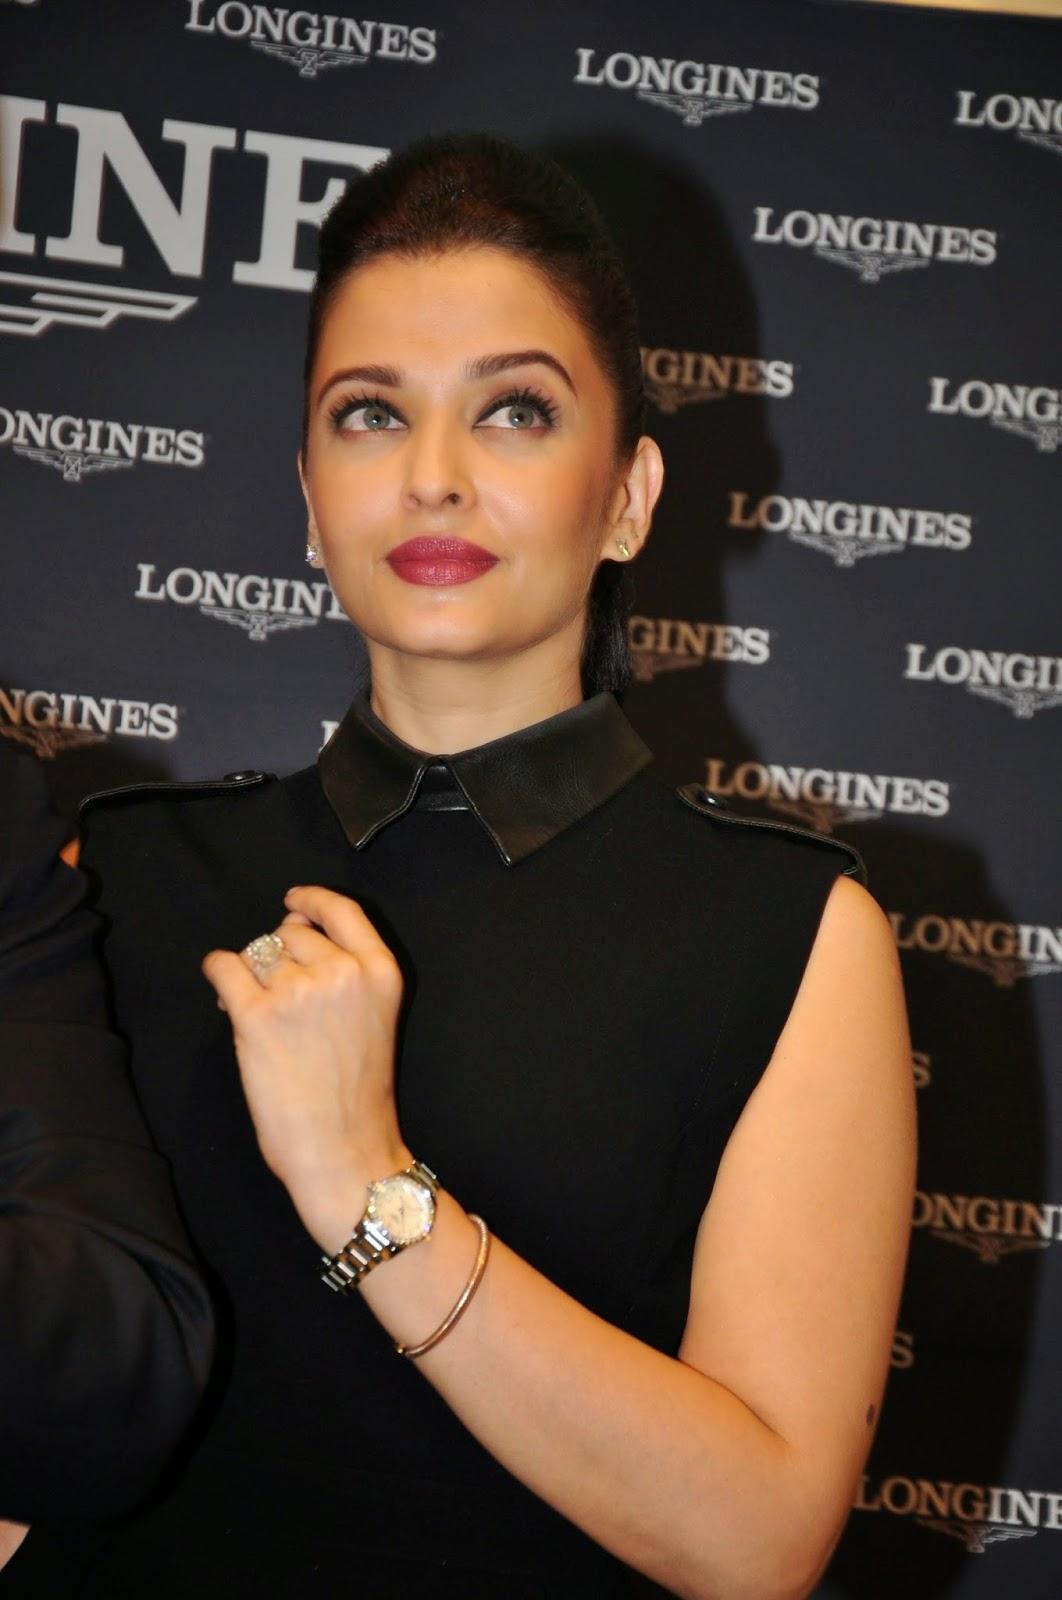 Aishwarya Rai Bachchan inaugurates Longines boutique